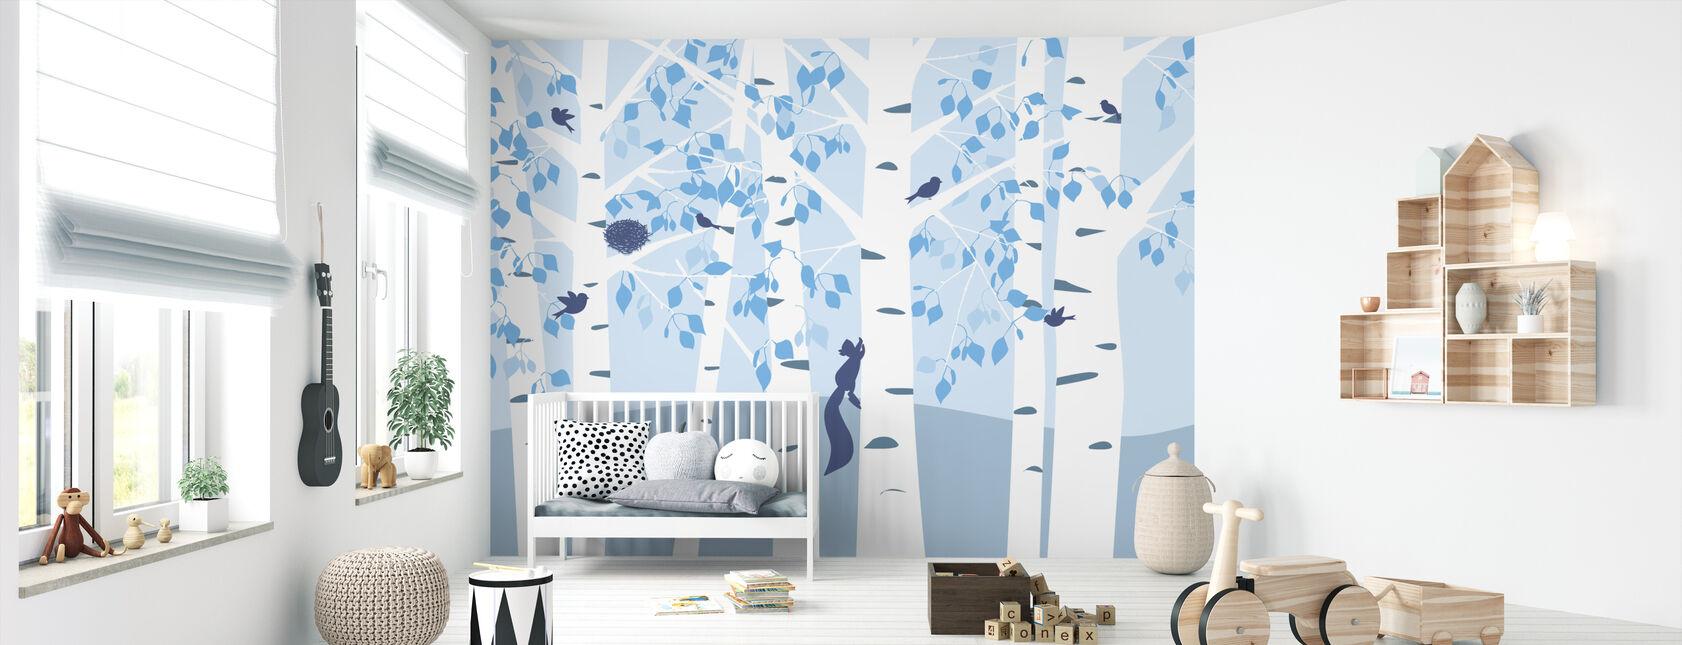 Birkeskov - Blå - Tapet - Babyværelse